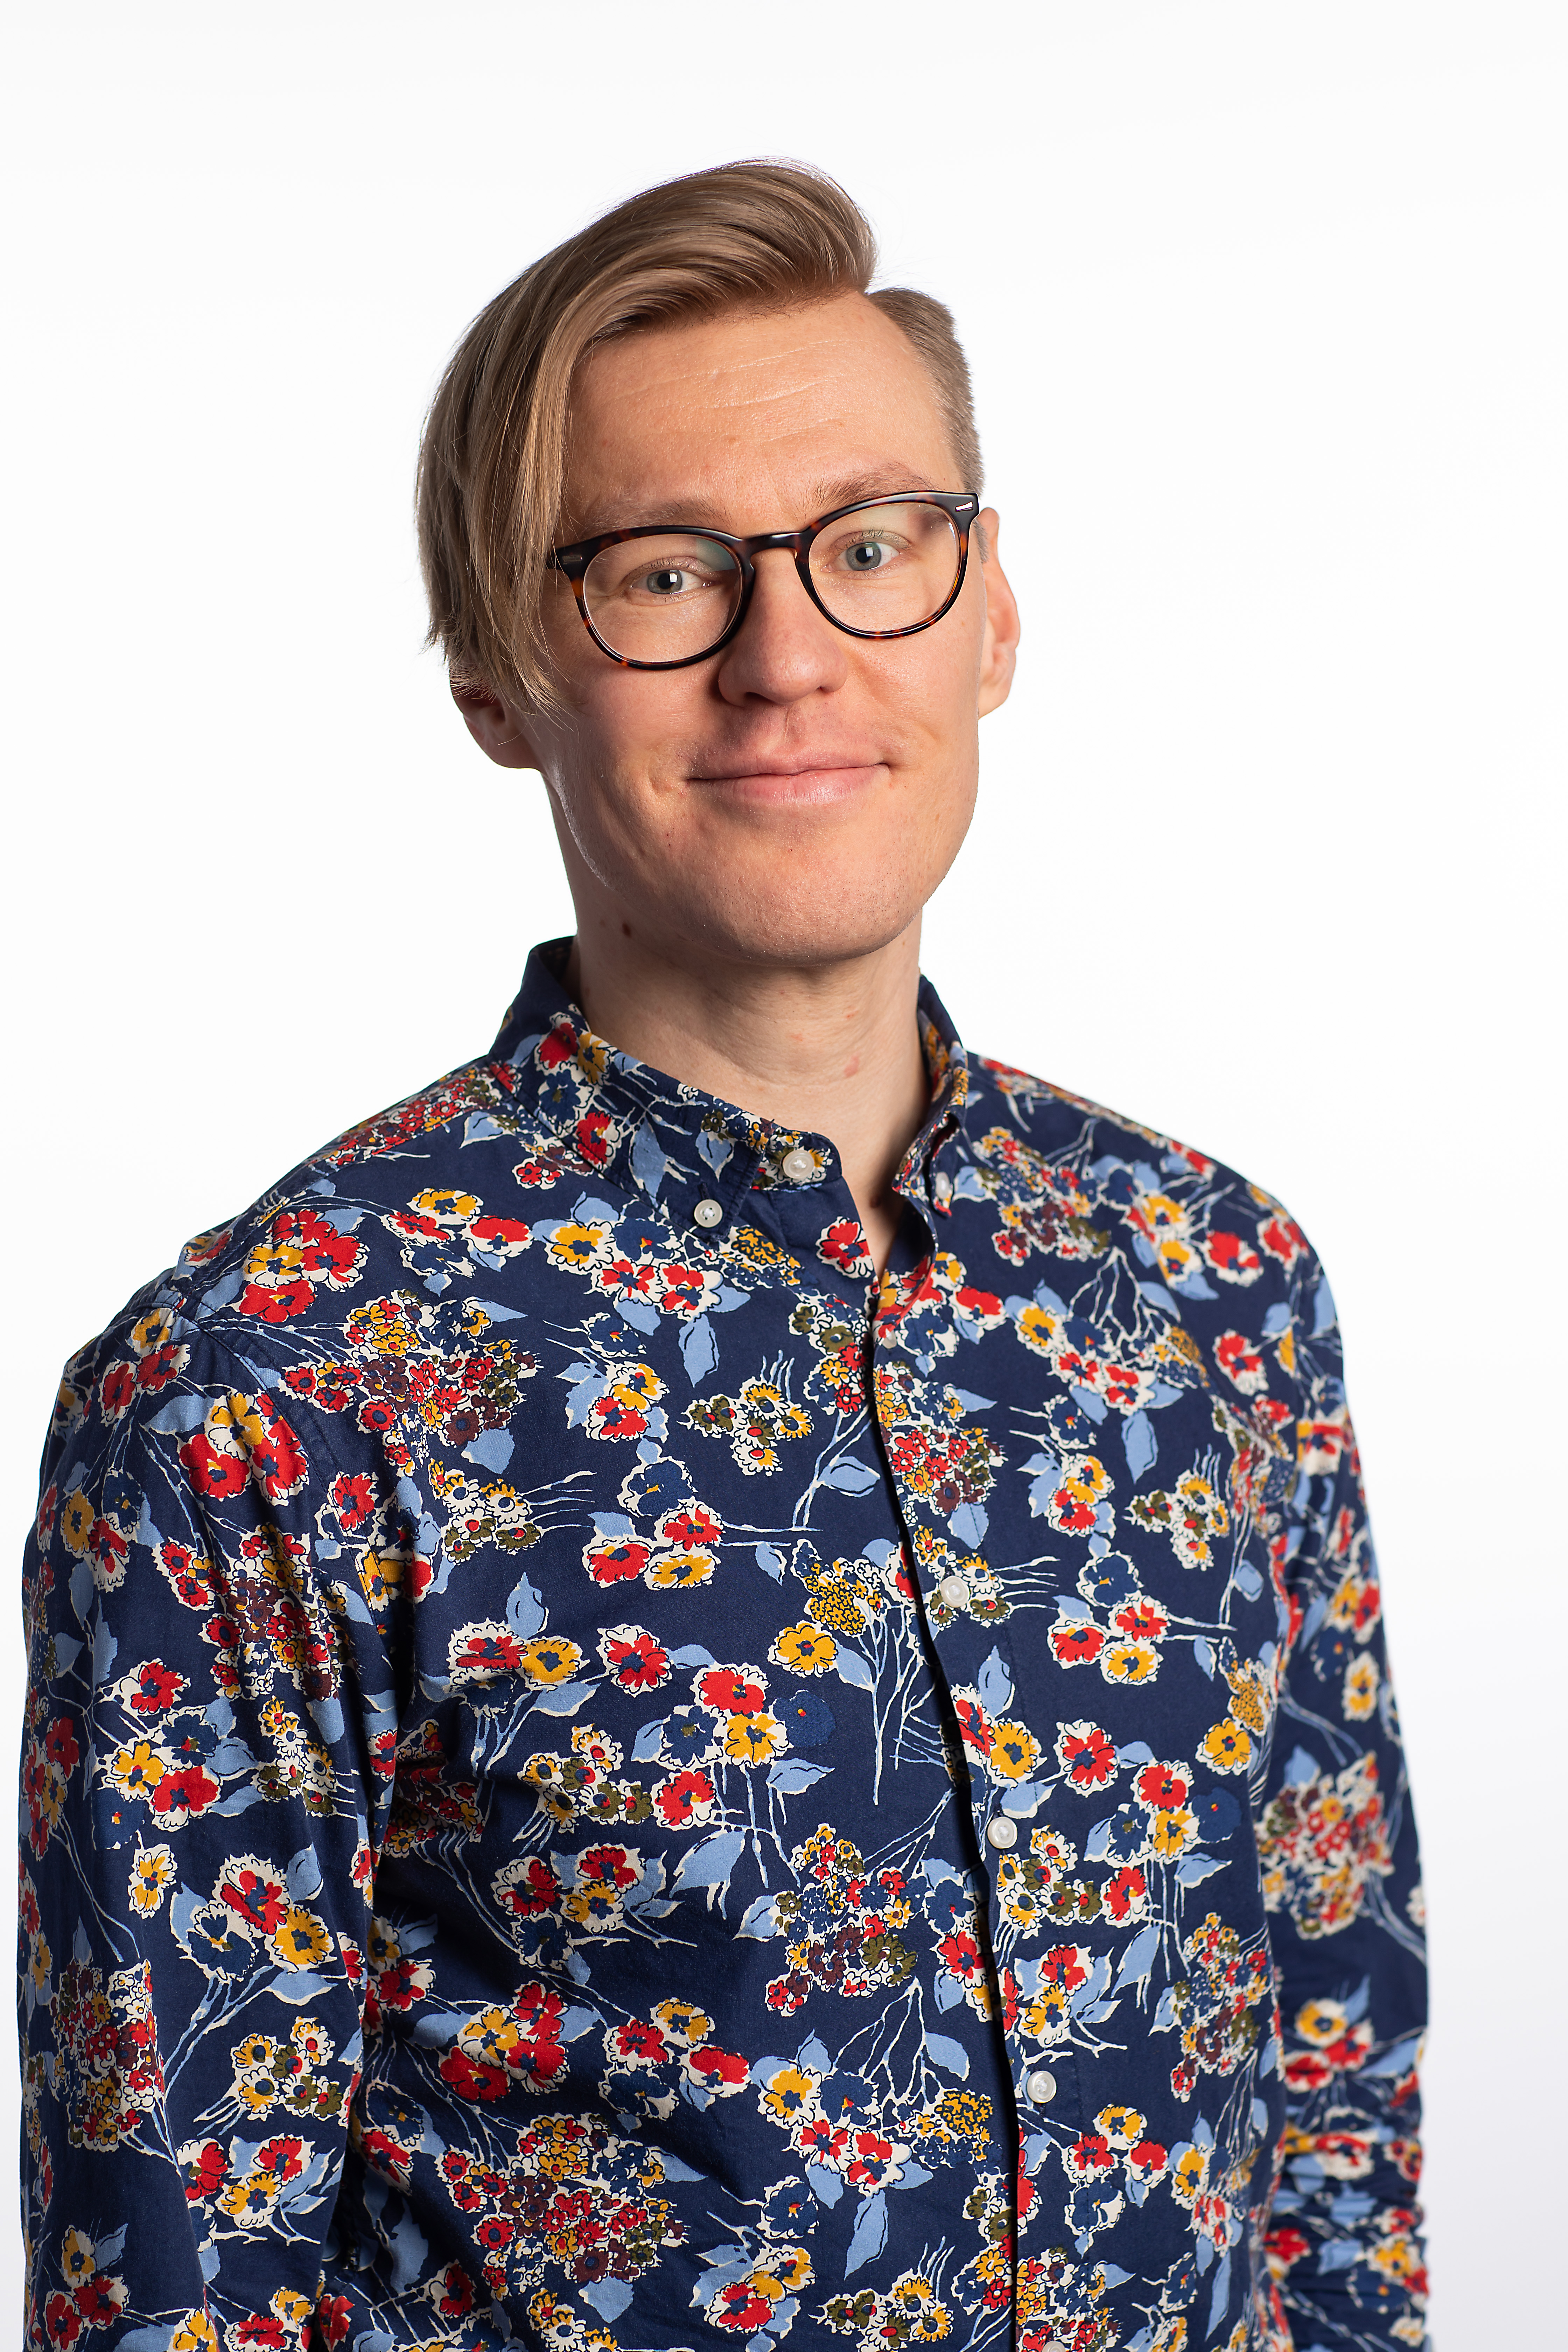 Antti Eronen, Business Owner, Vincit LaaS